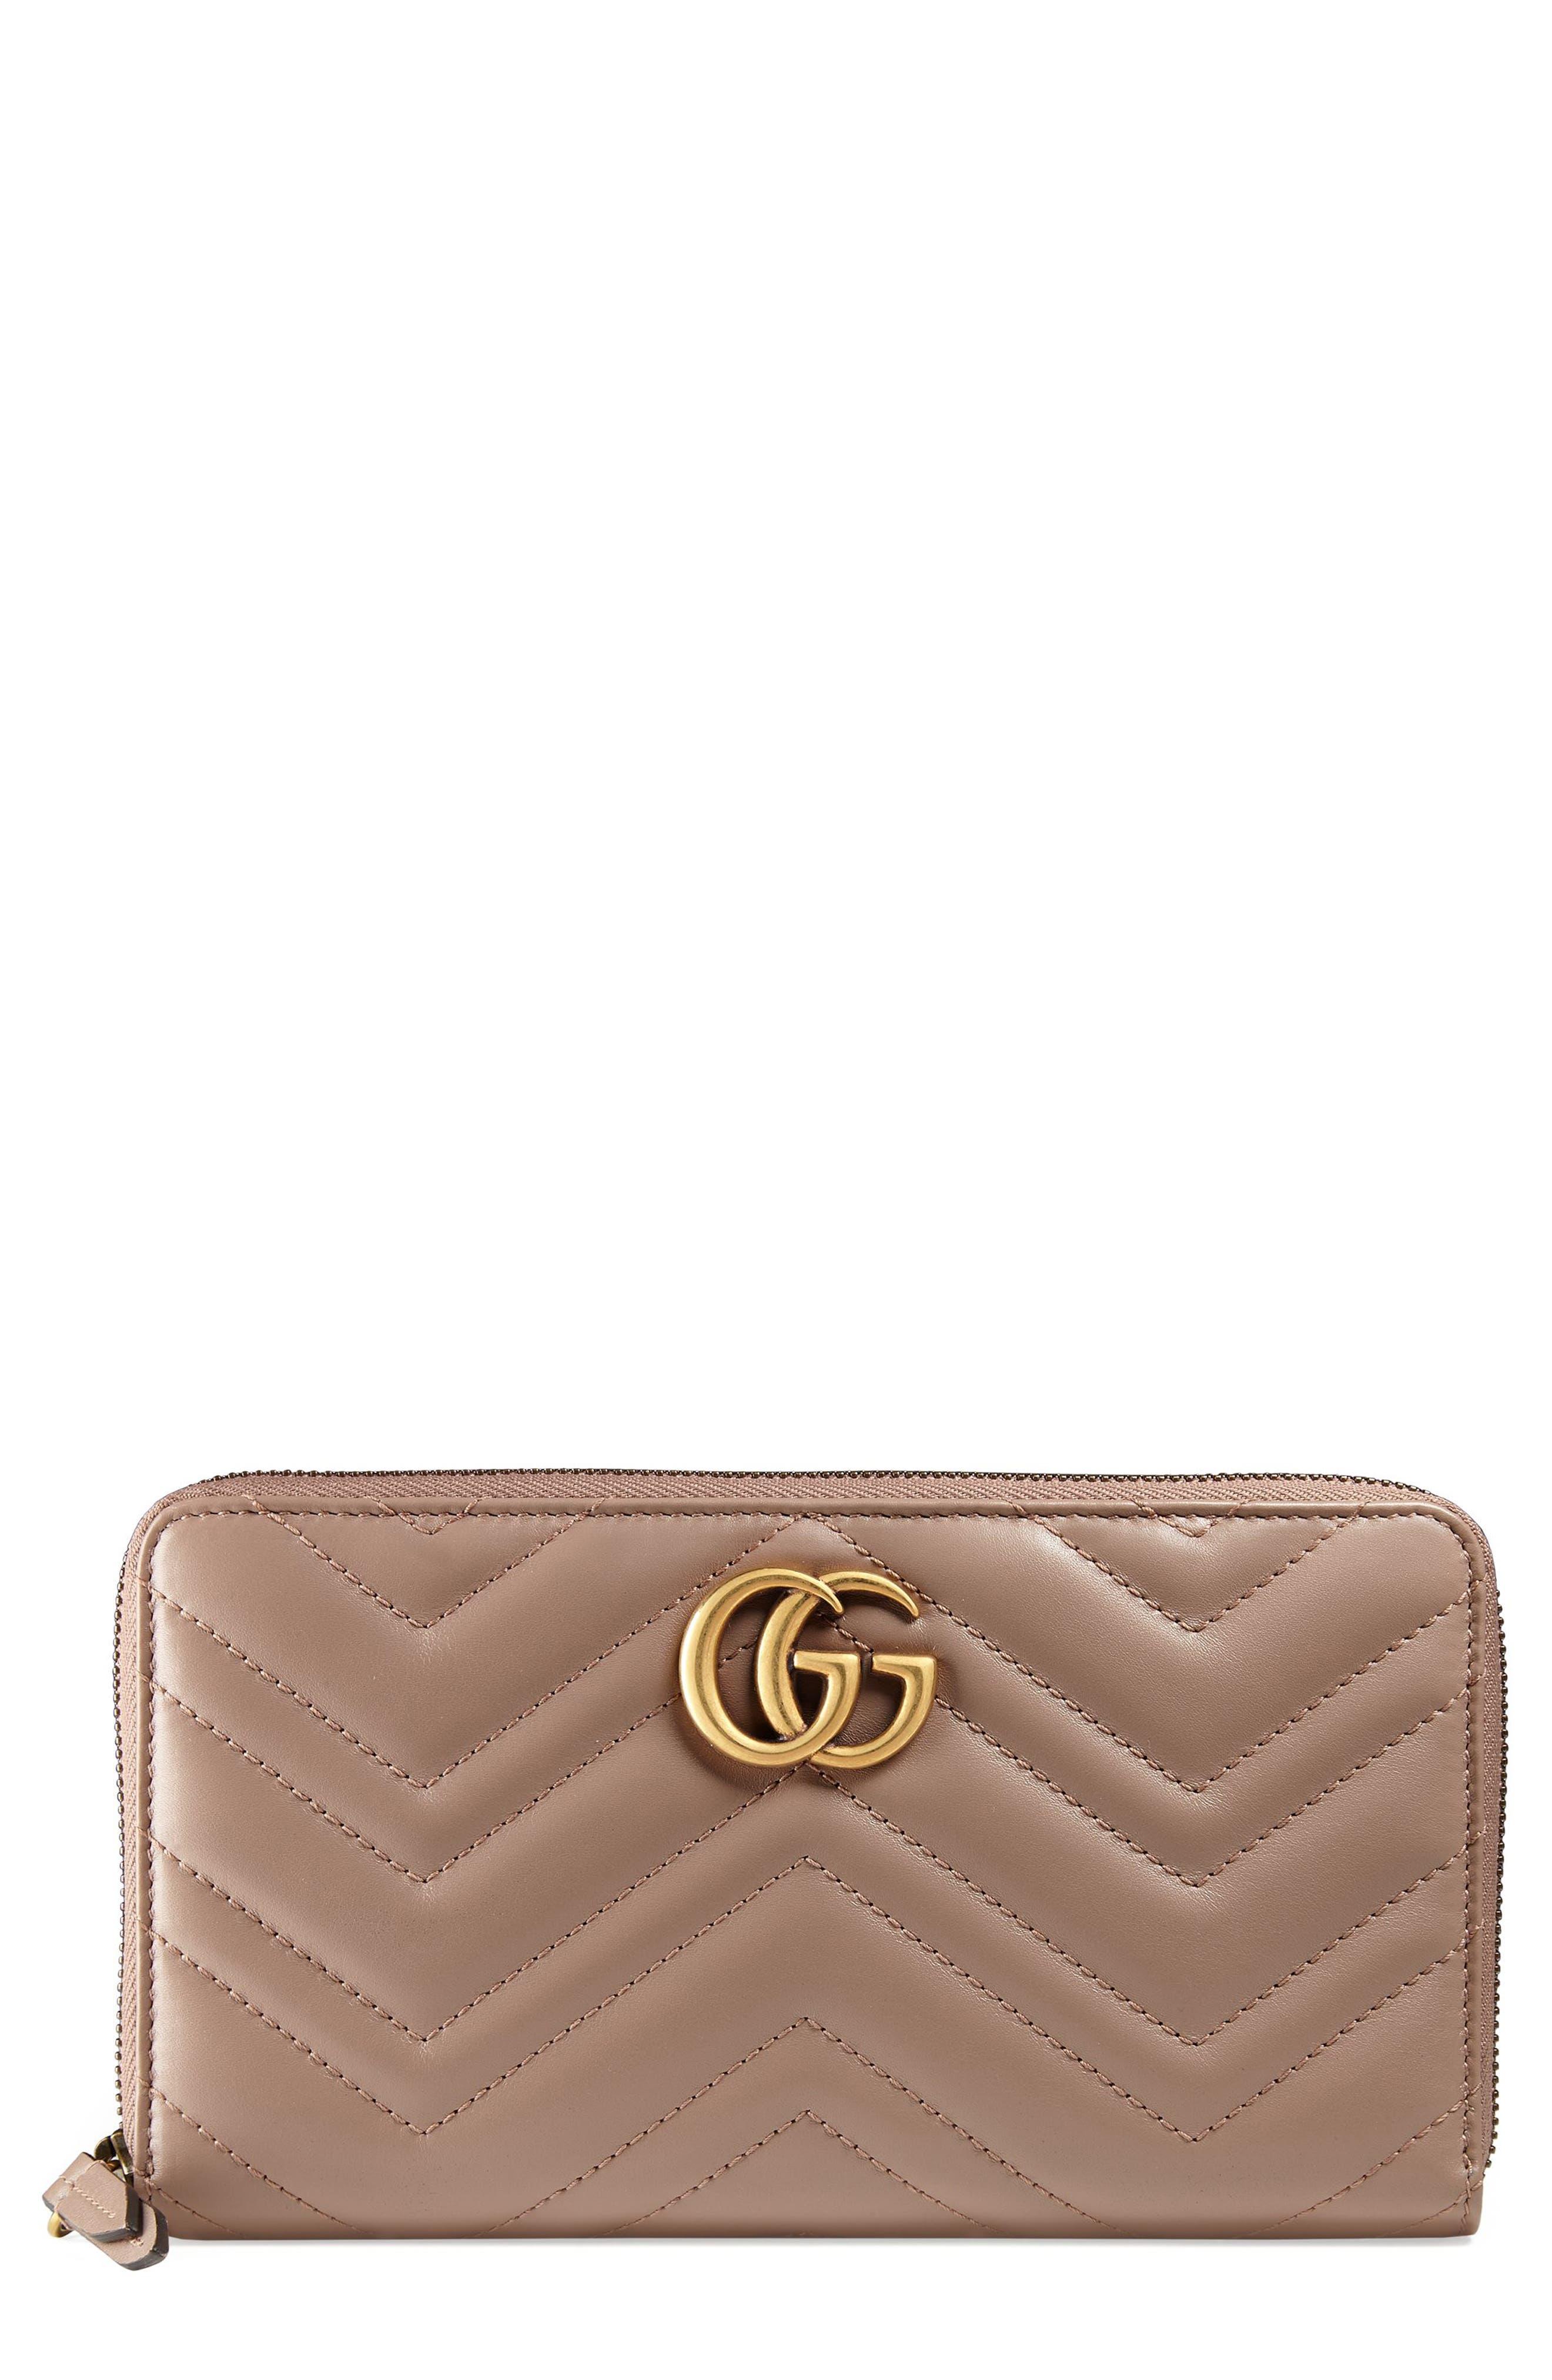 Main Image - Gucci GG Marmont Matelassé Leather Zip-Around Wallet